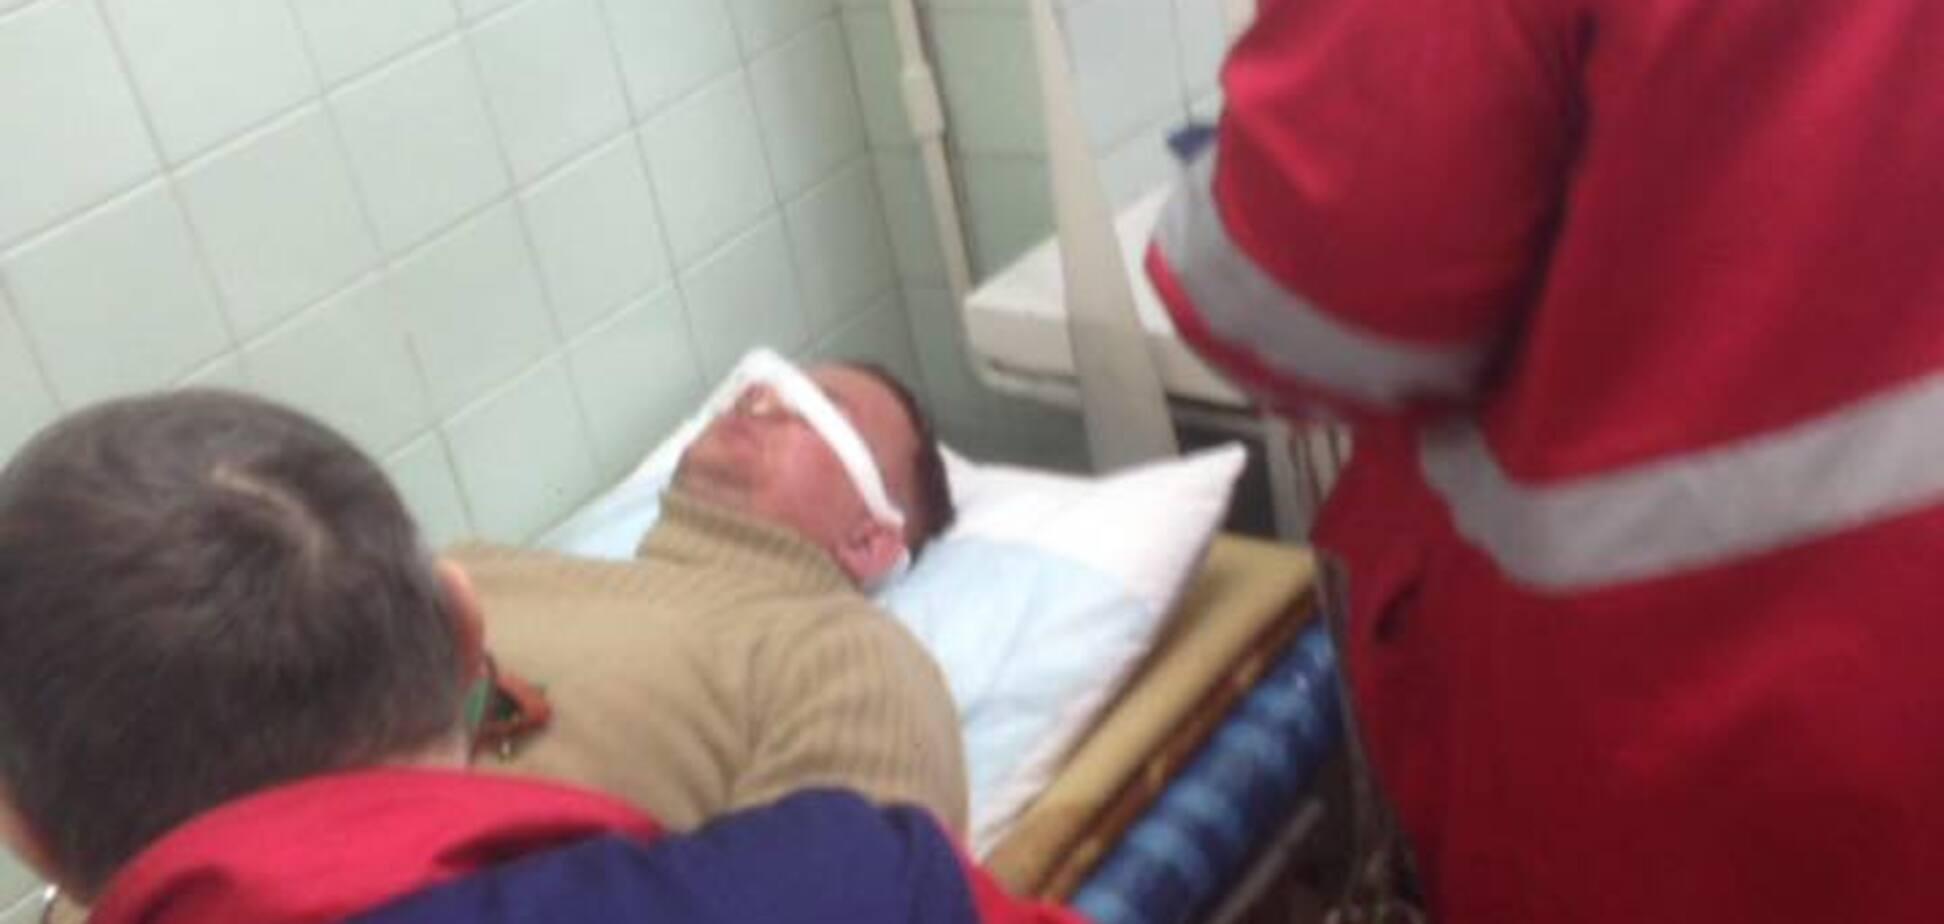 В Киеве до потери сознания избили нардепа Левченко: подробности